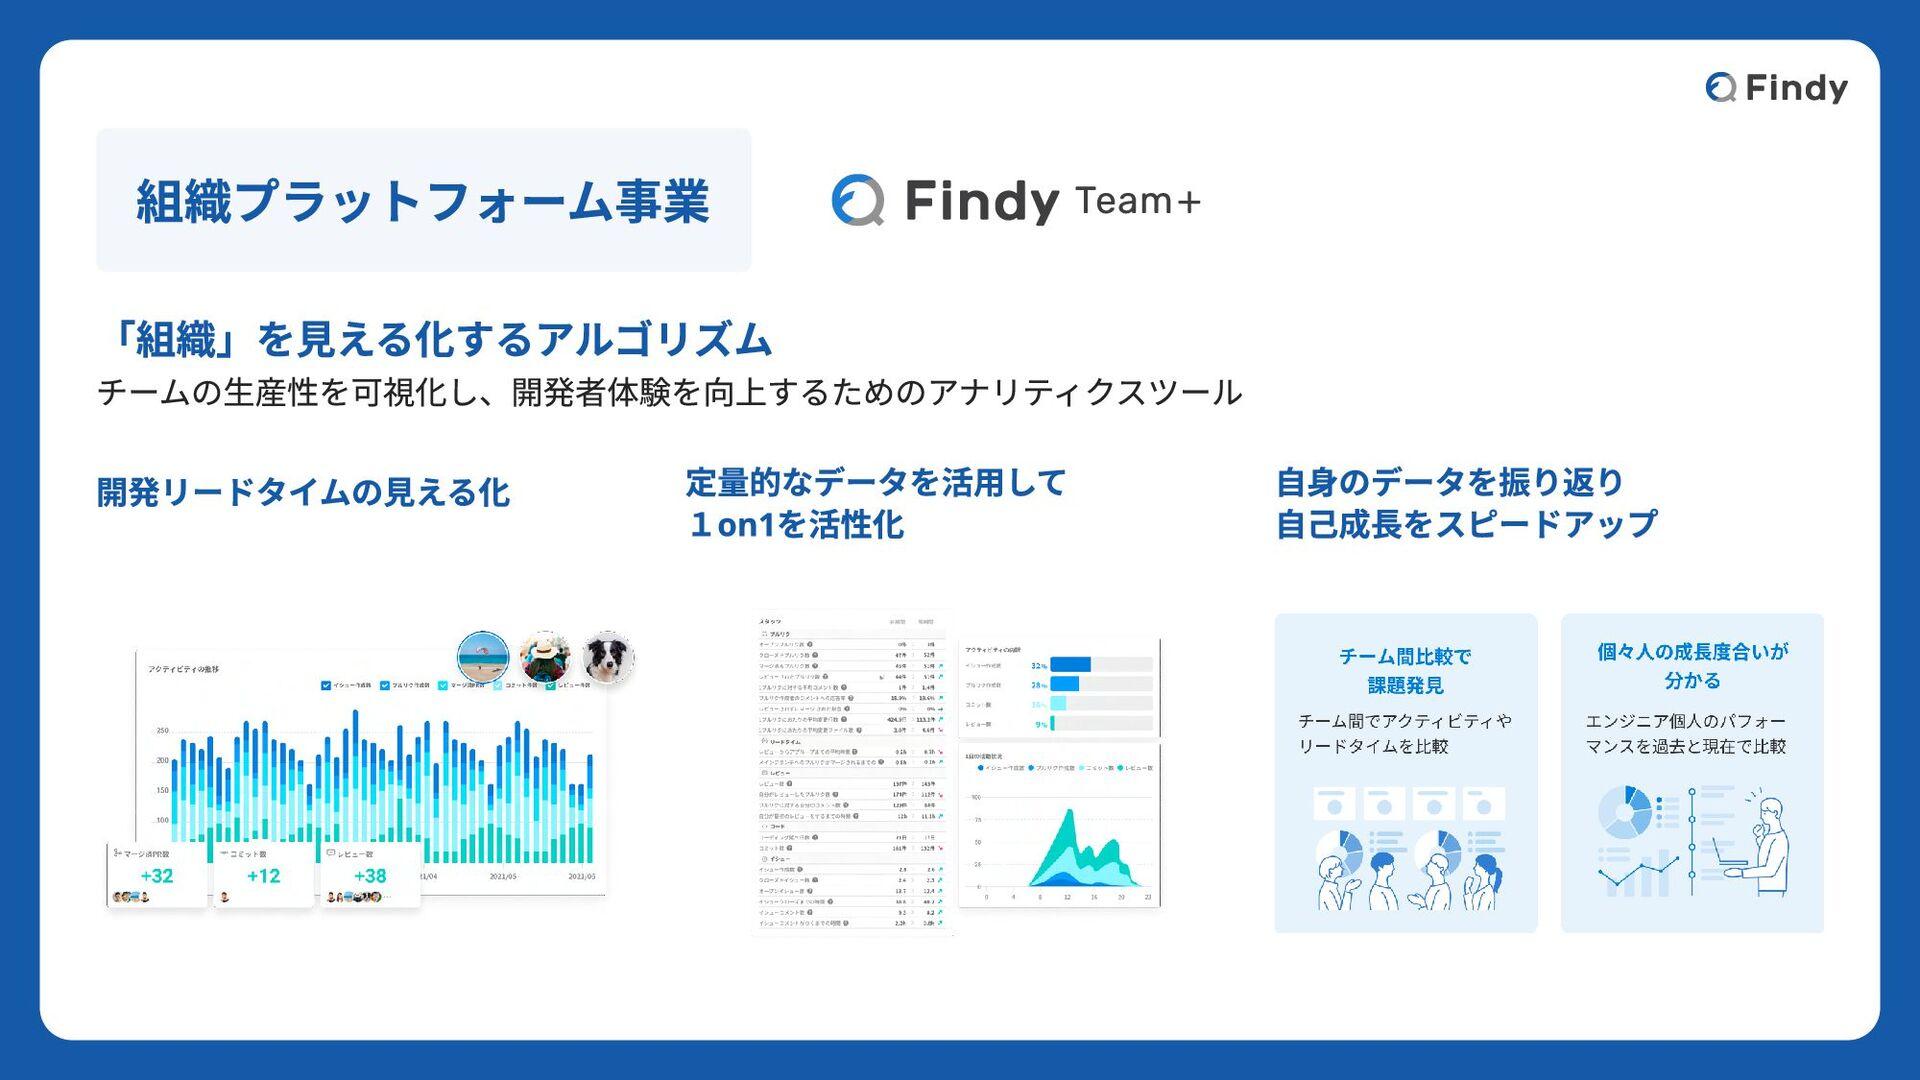 © 2020 Findy Inc. バリュー:「誠実」の例 ● ユーザサクセスチーム ○ エン...